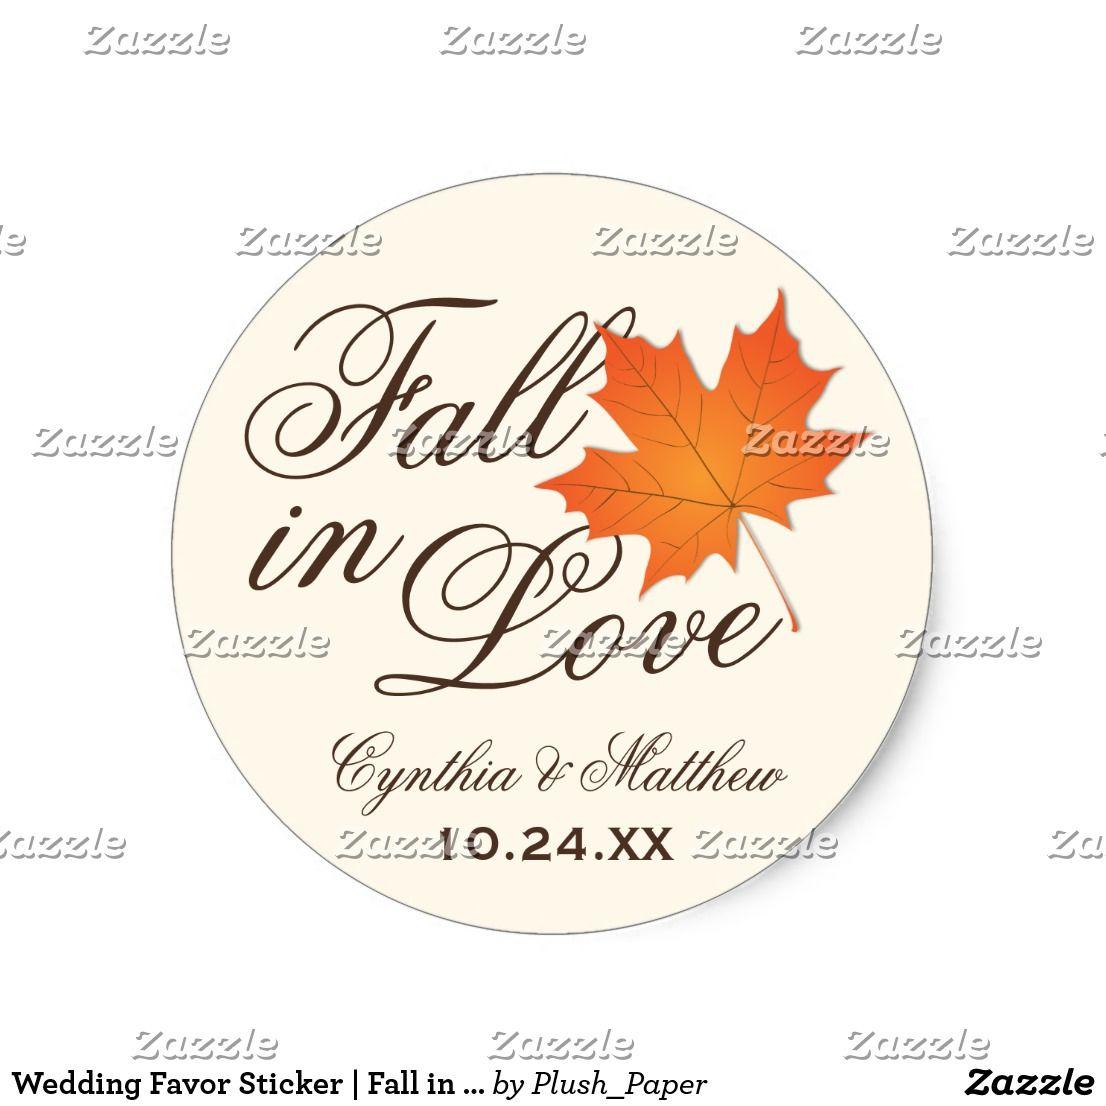 Wedding Favor Sticker | Fall in Love Theme | Favors, Themed weddings ...